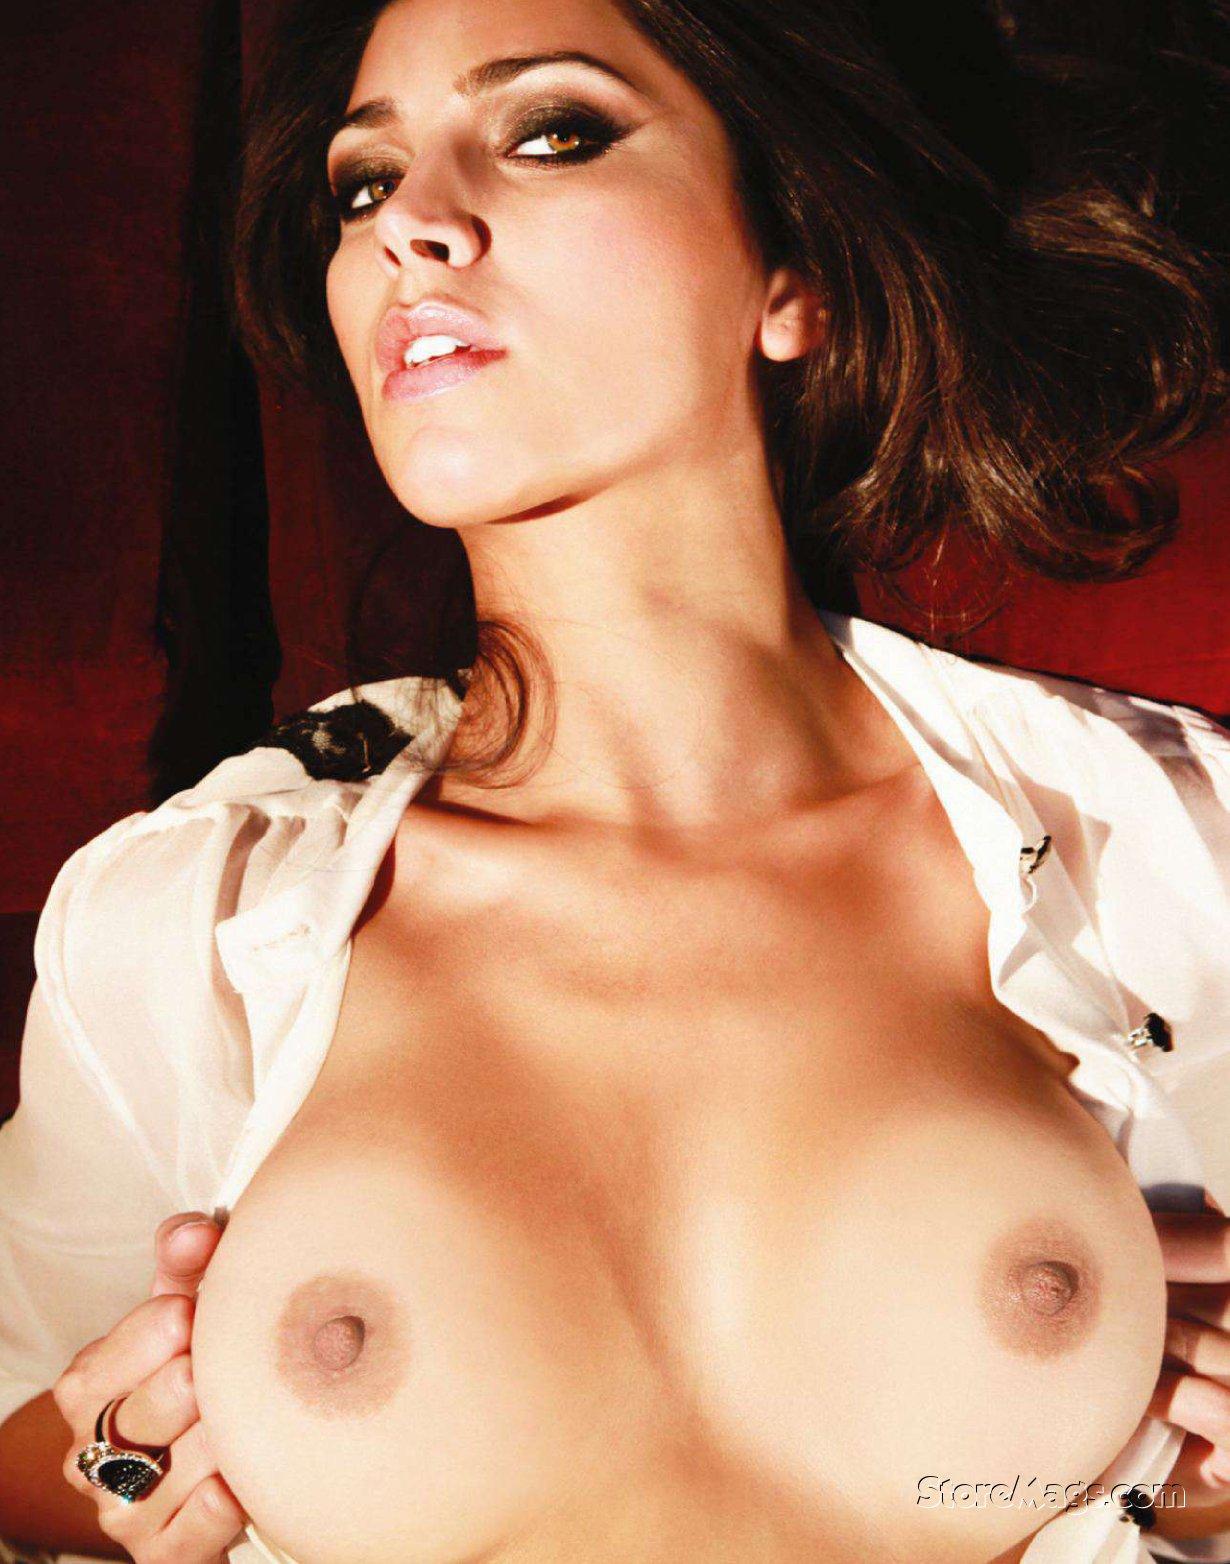 http://1.bp.blogspot.com/-jk_u80gbB5Y/TgOIdE1_cpI/AAAAAAAADEg/jCJbnKSzCBQ/s1600/Solange+Gomez+Nude+For+Playboy+Argentina+www.GutterUncensored.com+002.jpg